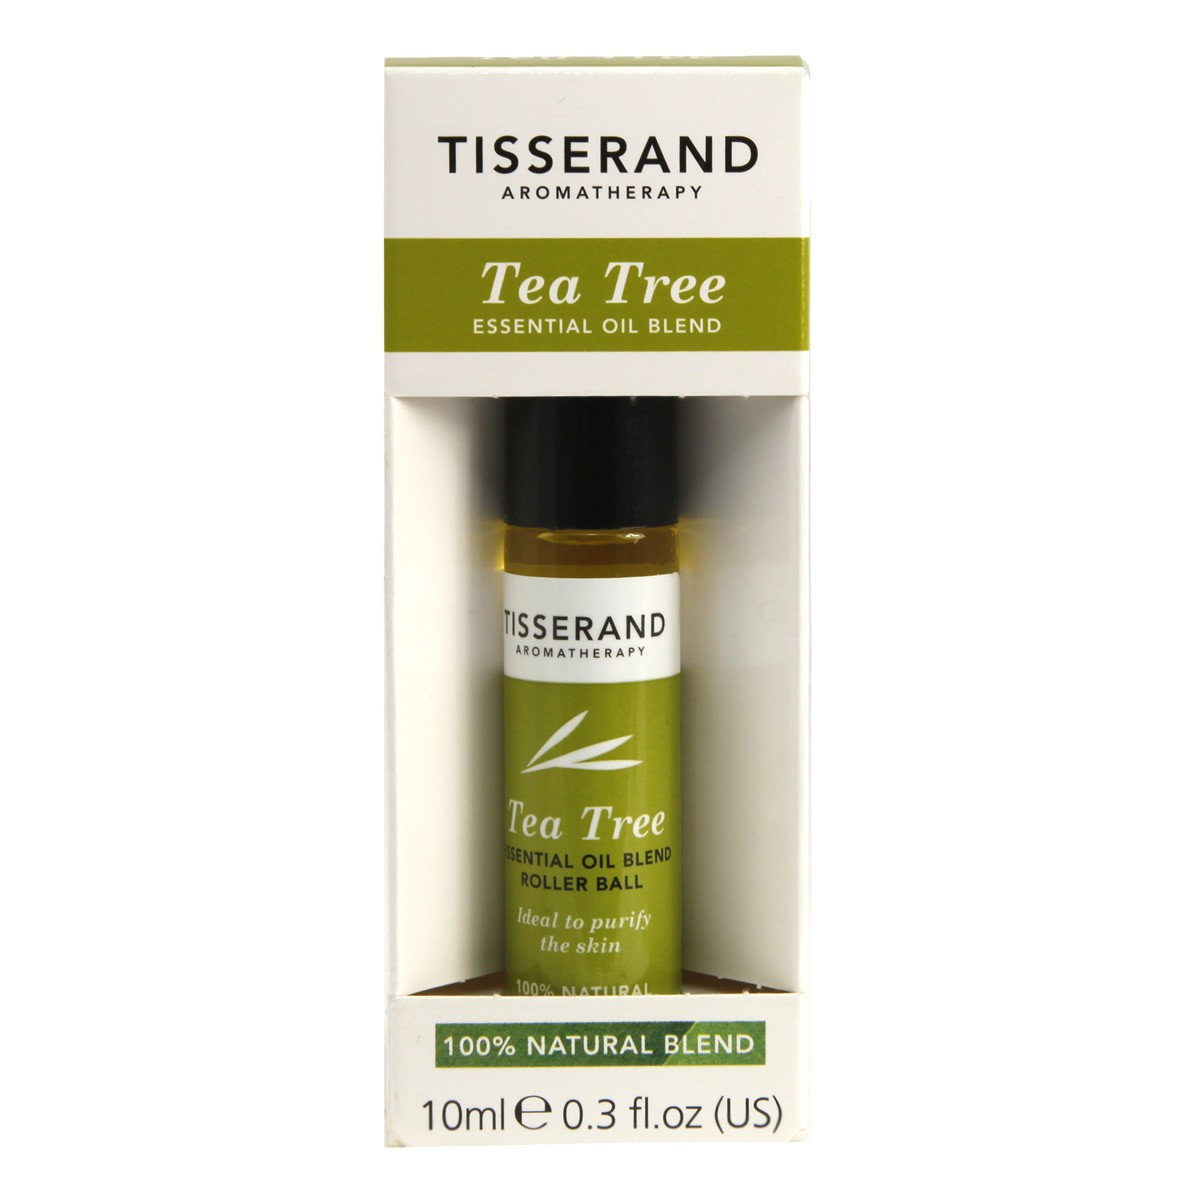 Tisserand Tea Tree Essential Oil Blend Roller Ball